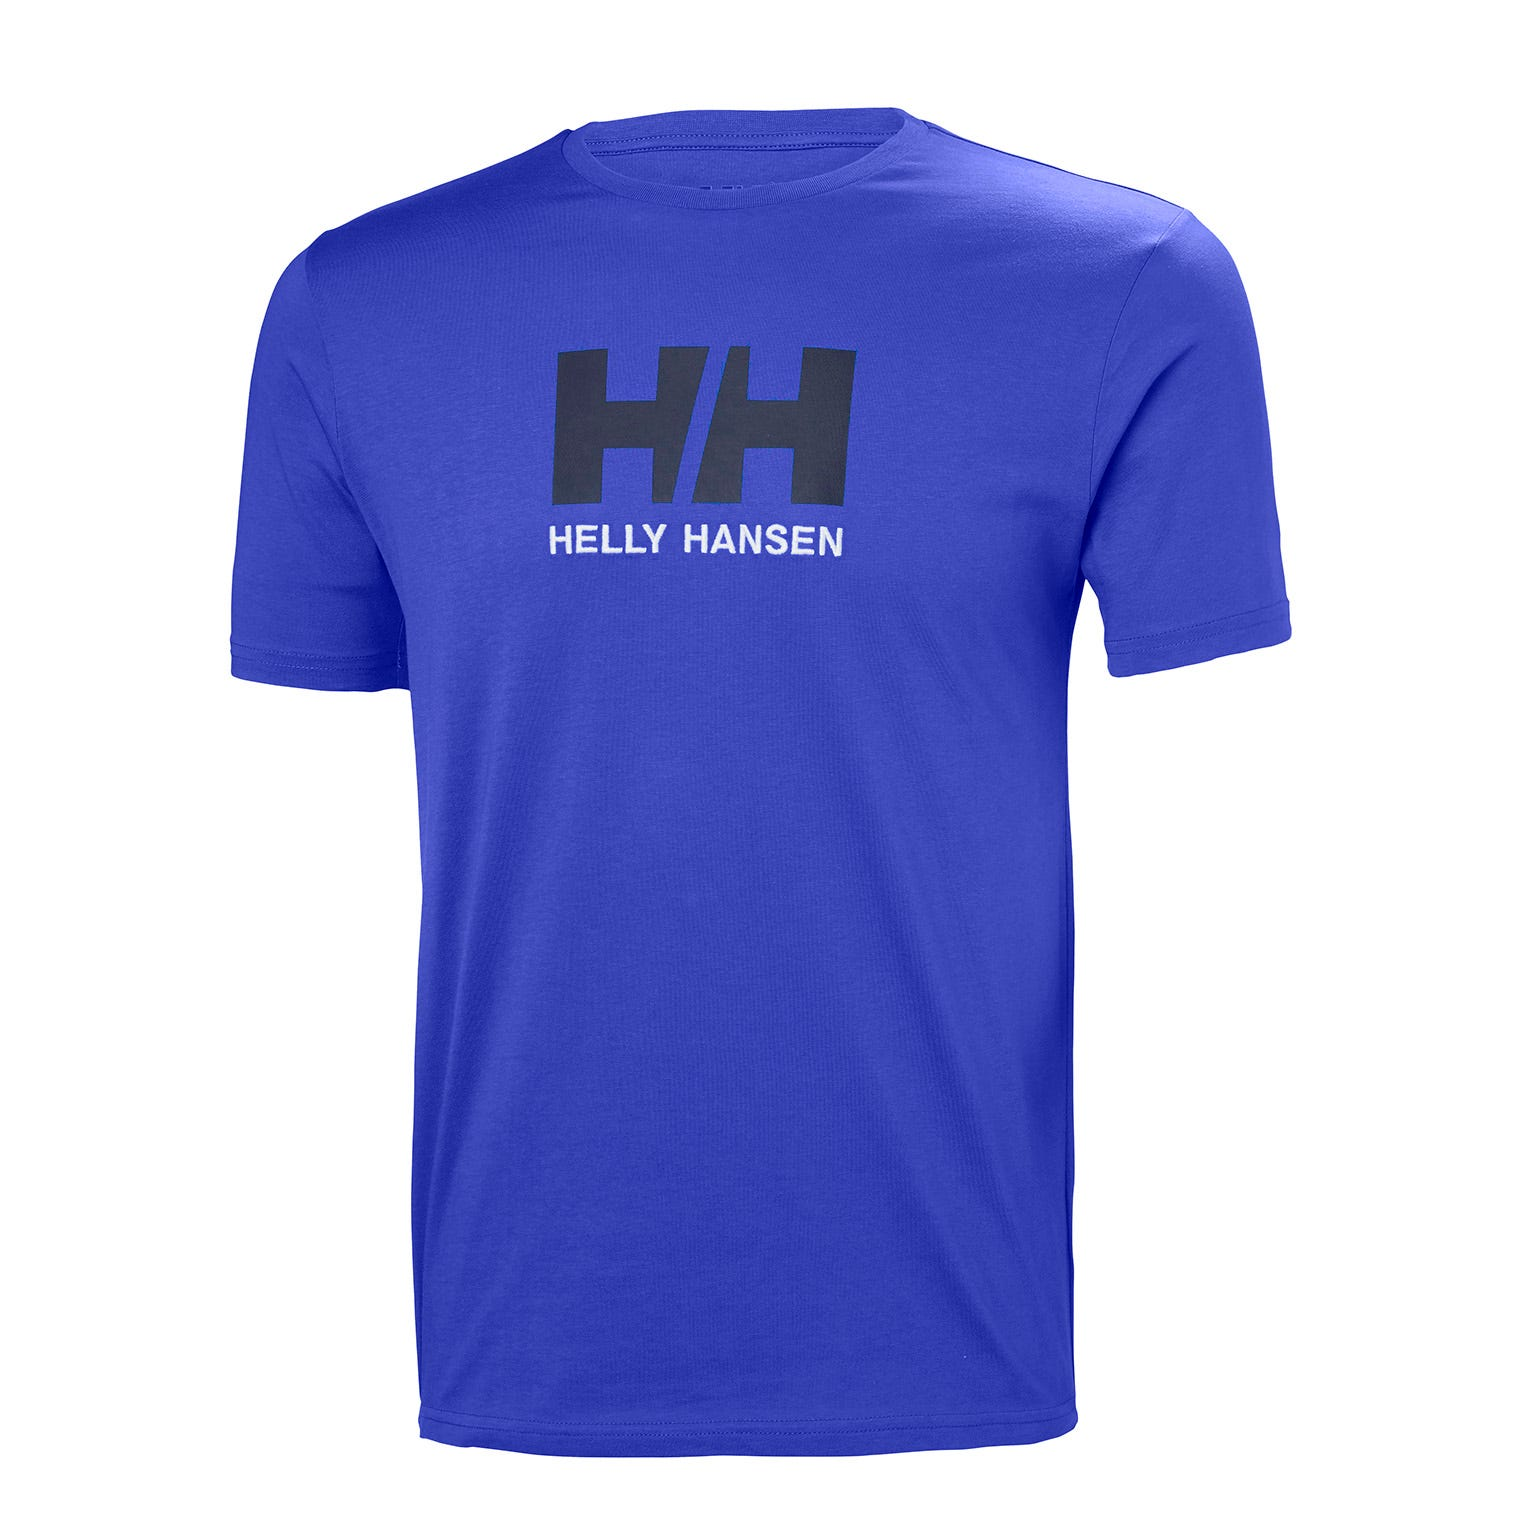 Helly Hansen Mens Hh Logo Tshirt Blue S